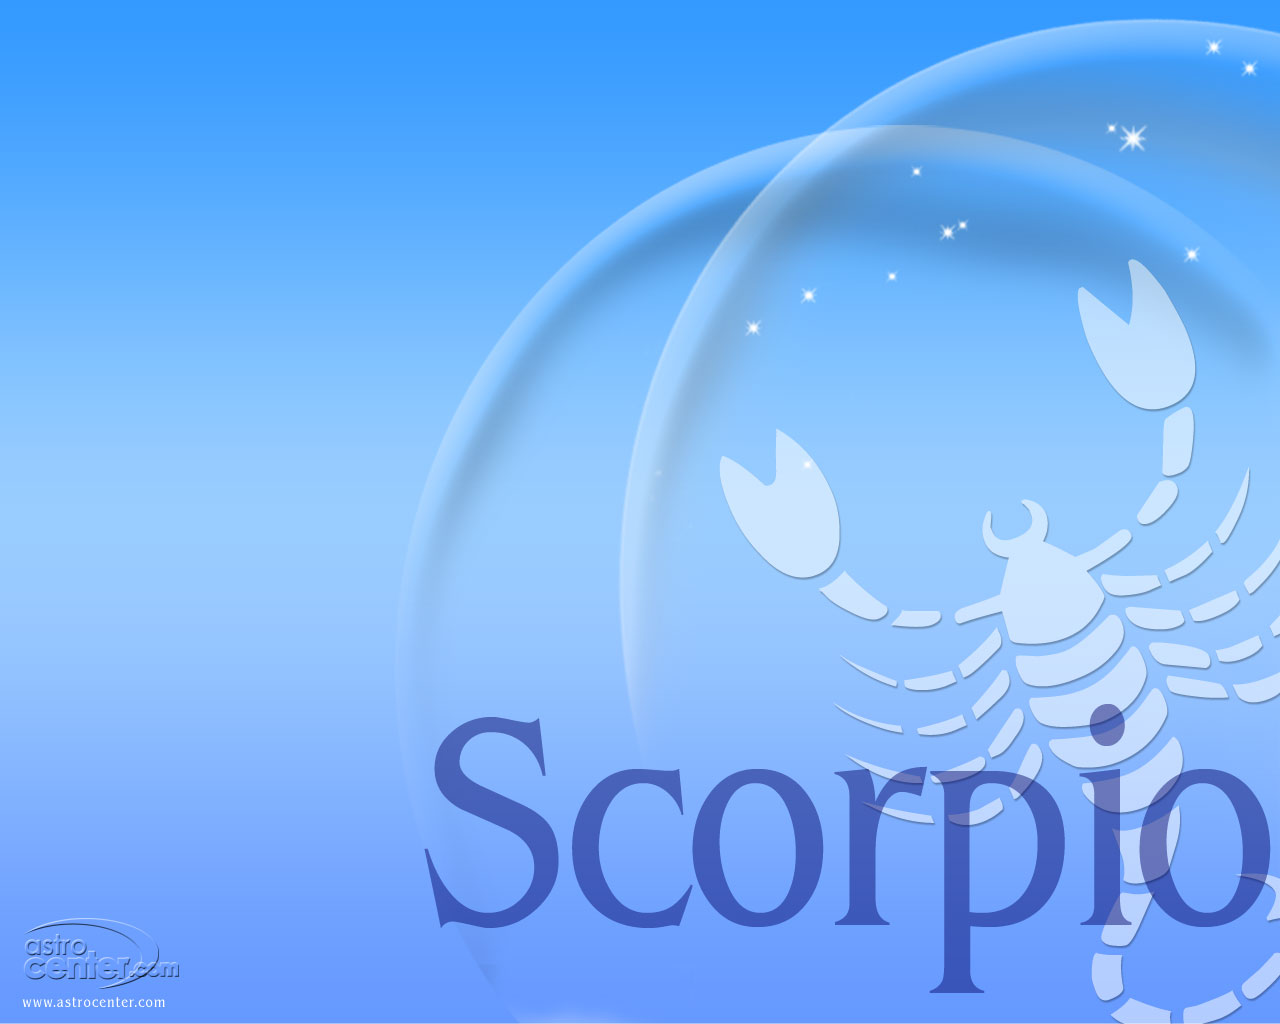 Scorpio Horoscope Wallpaper Zodiac signs scorpio